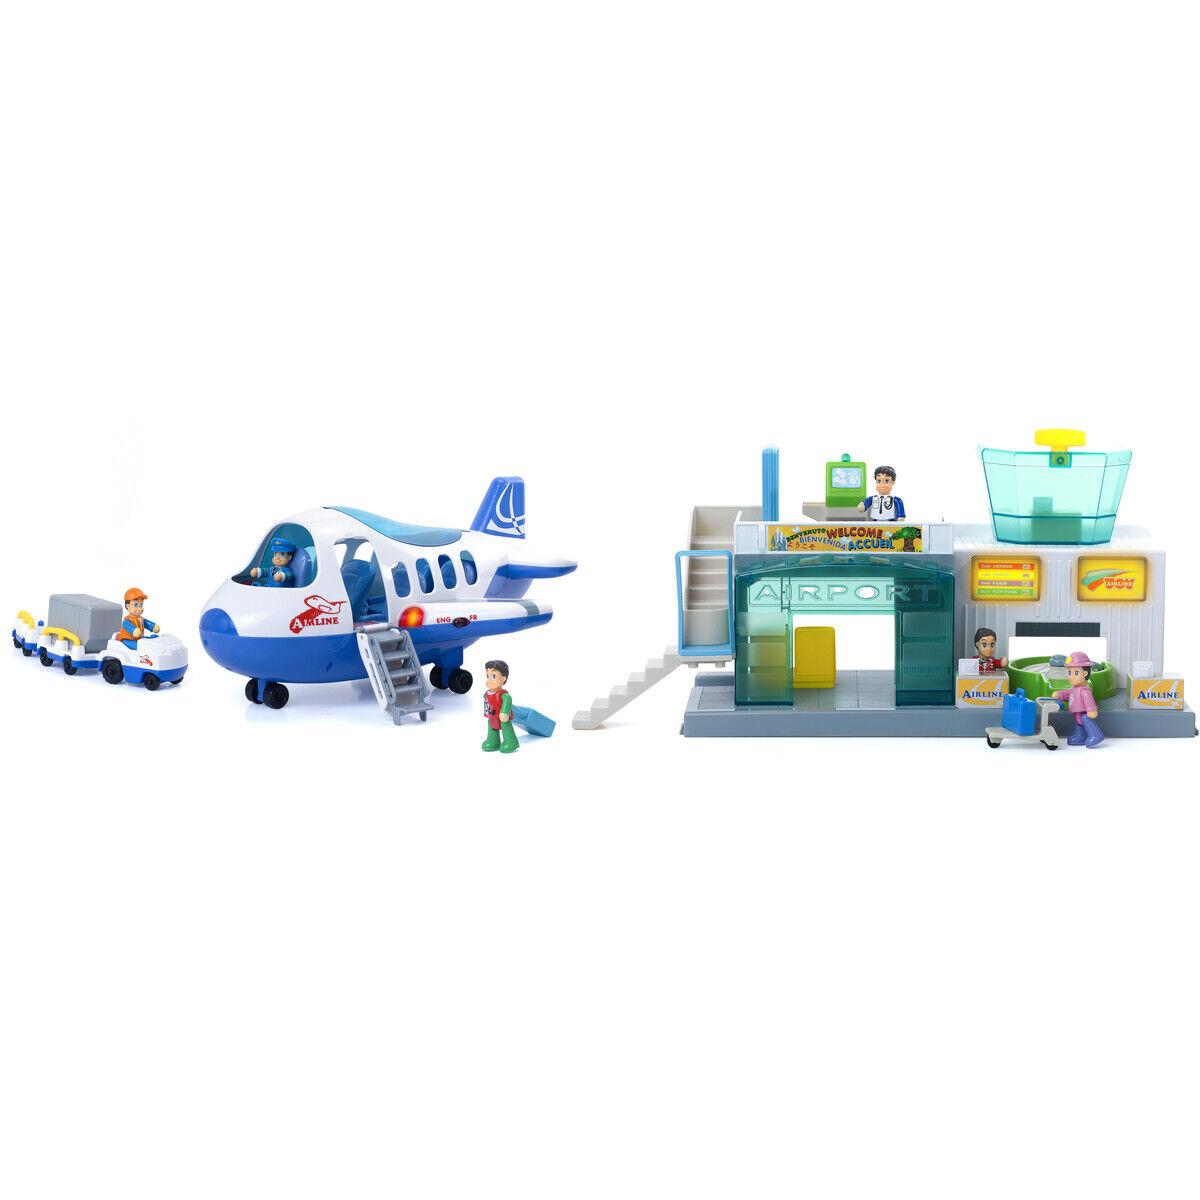 NEW Little Learner Airport Playset Pretend Pilot Terminal Happkid Birthday Gift